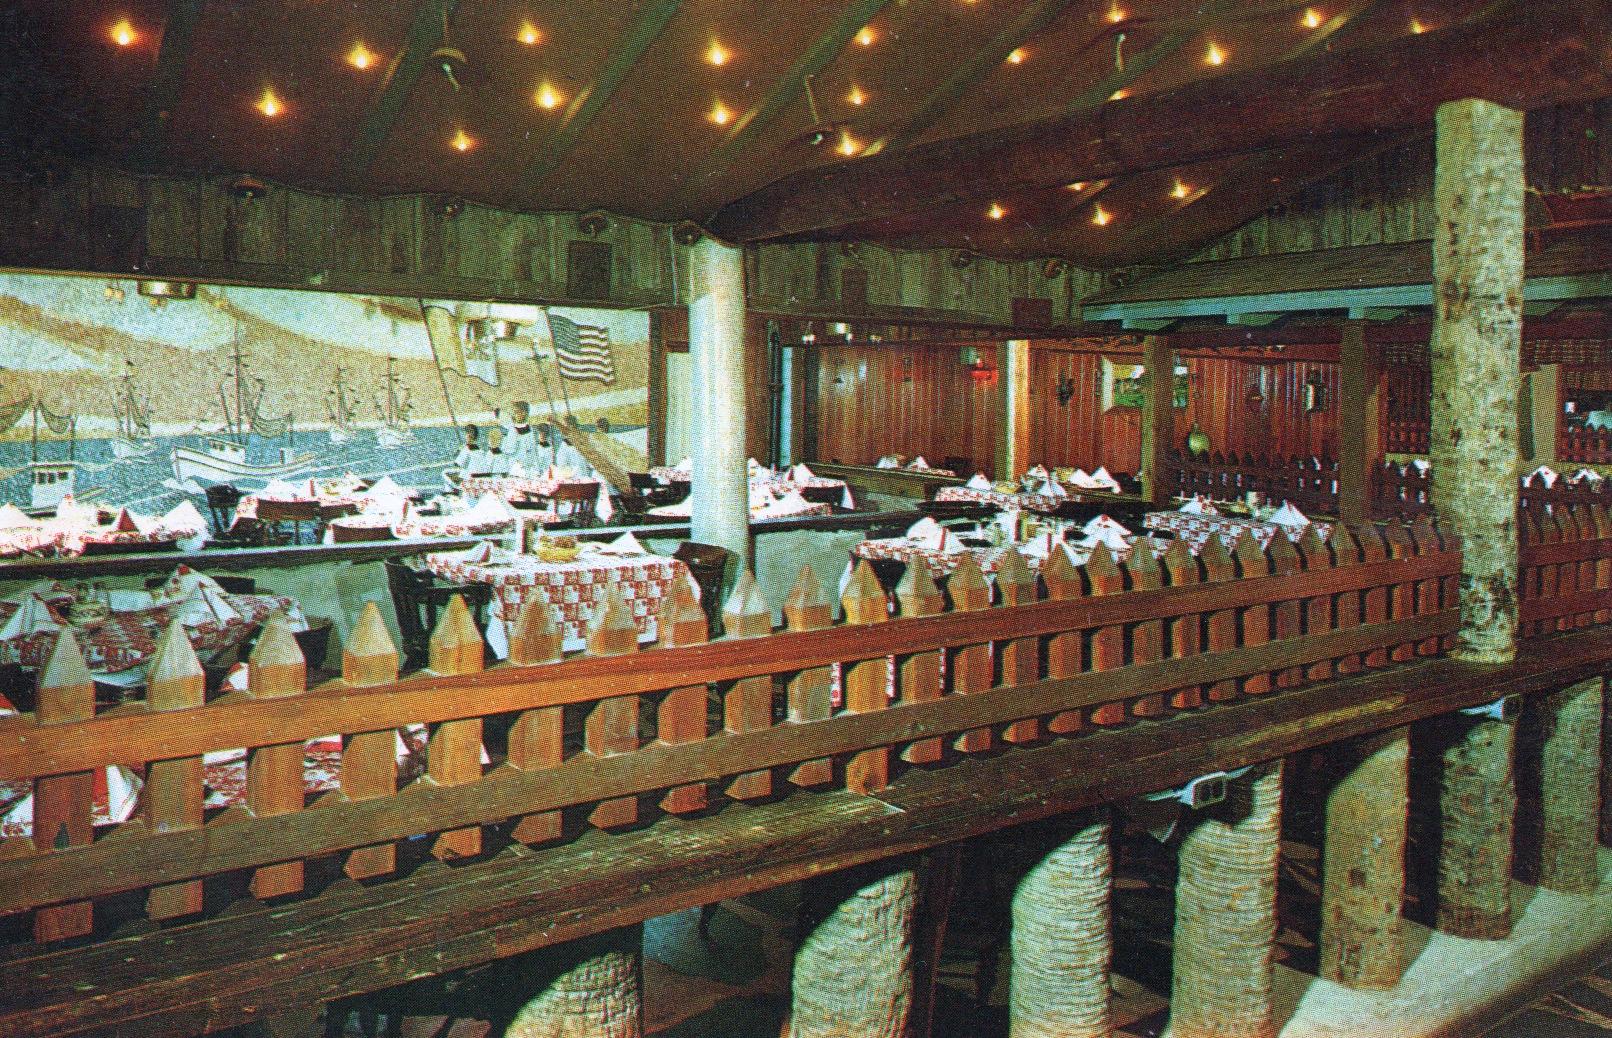 Going Inside Sun N Sand Hotel Biloxi Preservation In Mississippi